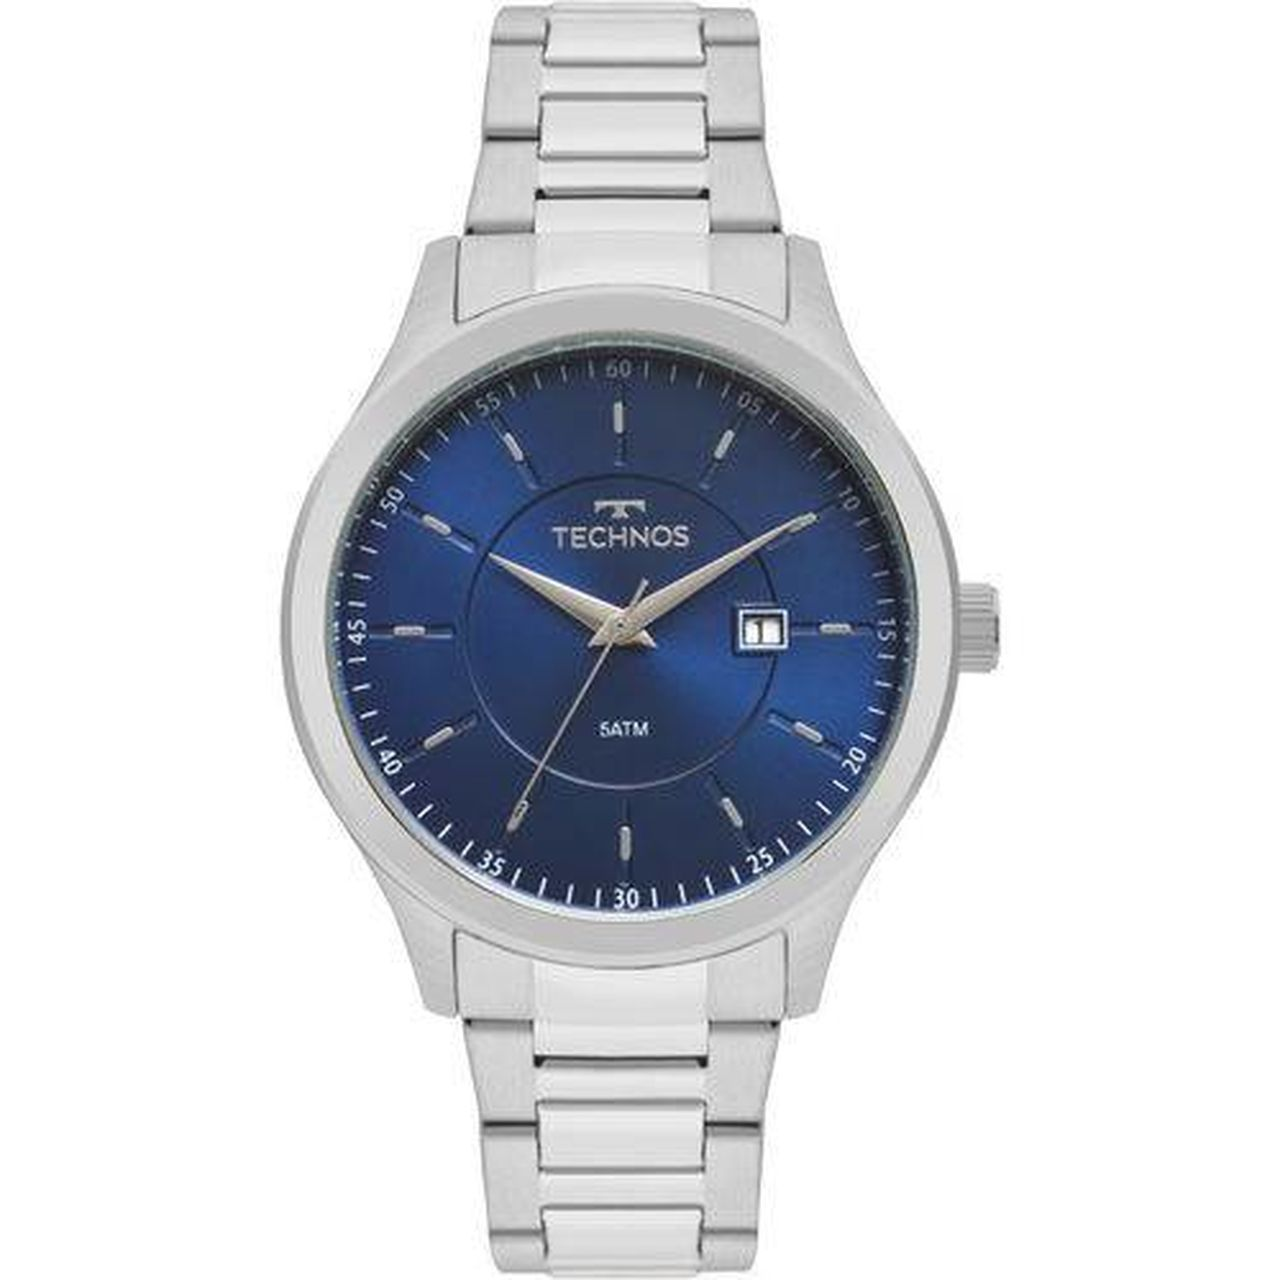 Relógio Technos Classic Steel Masculino 2115mpr1/a Prateado Com Fundo Azul